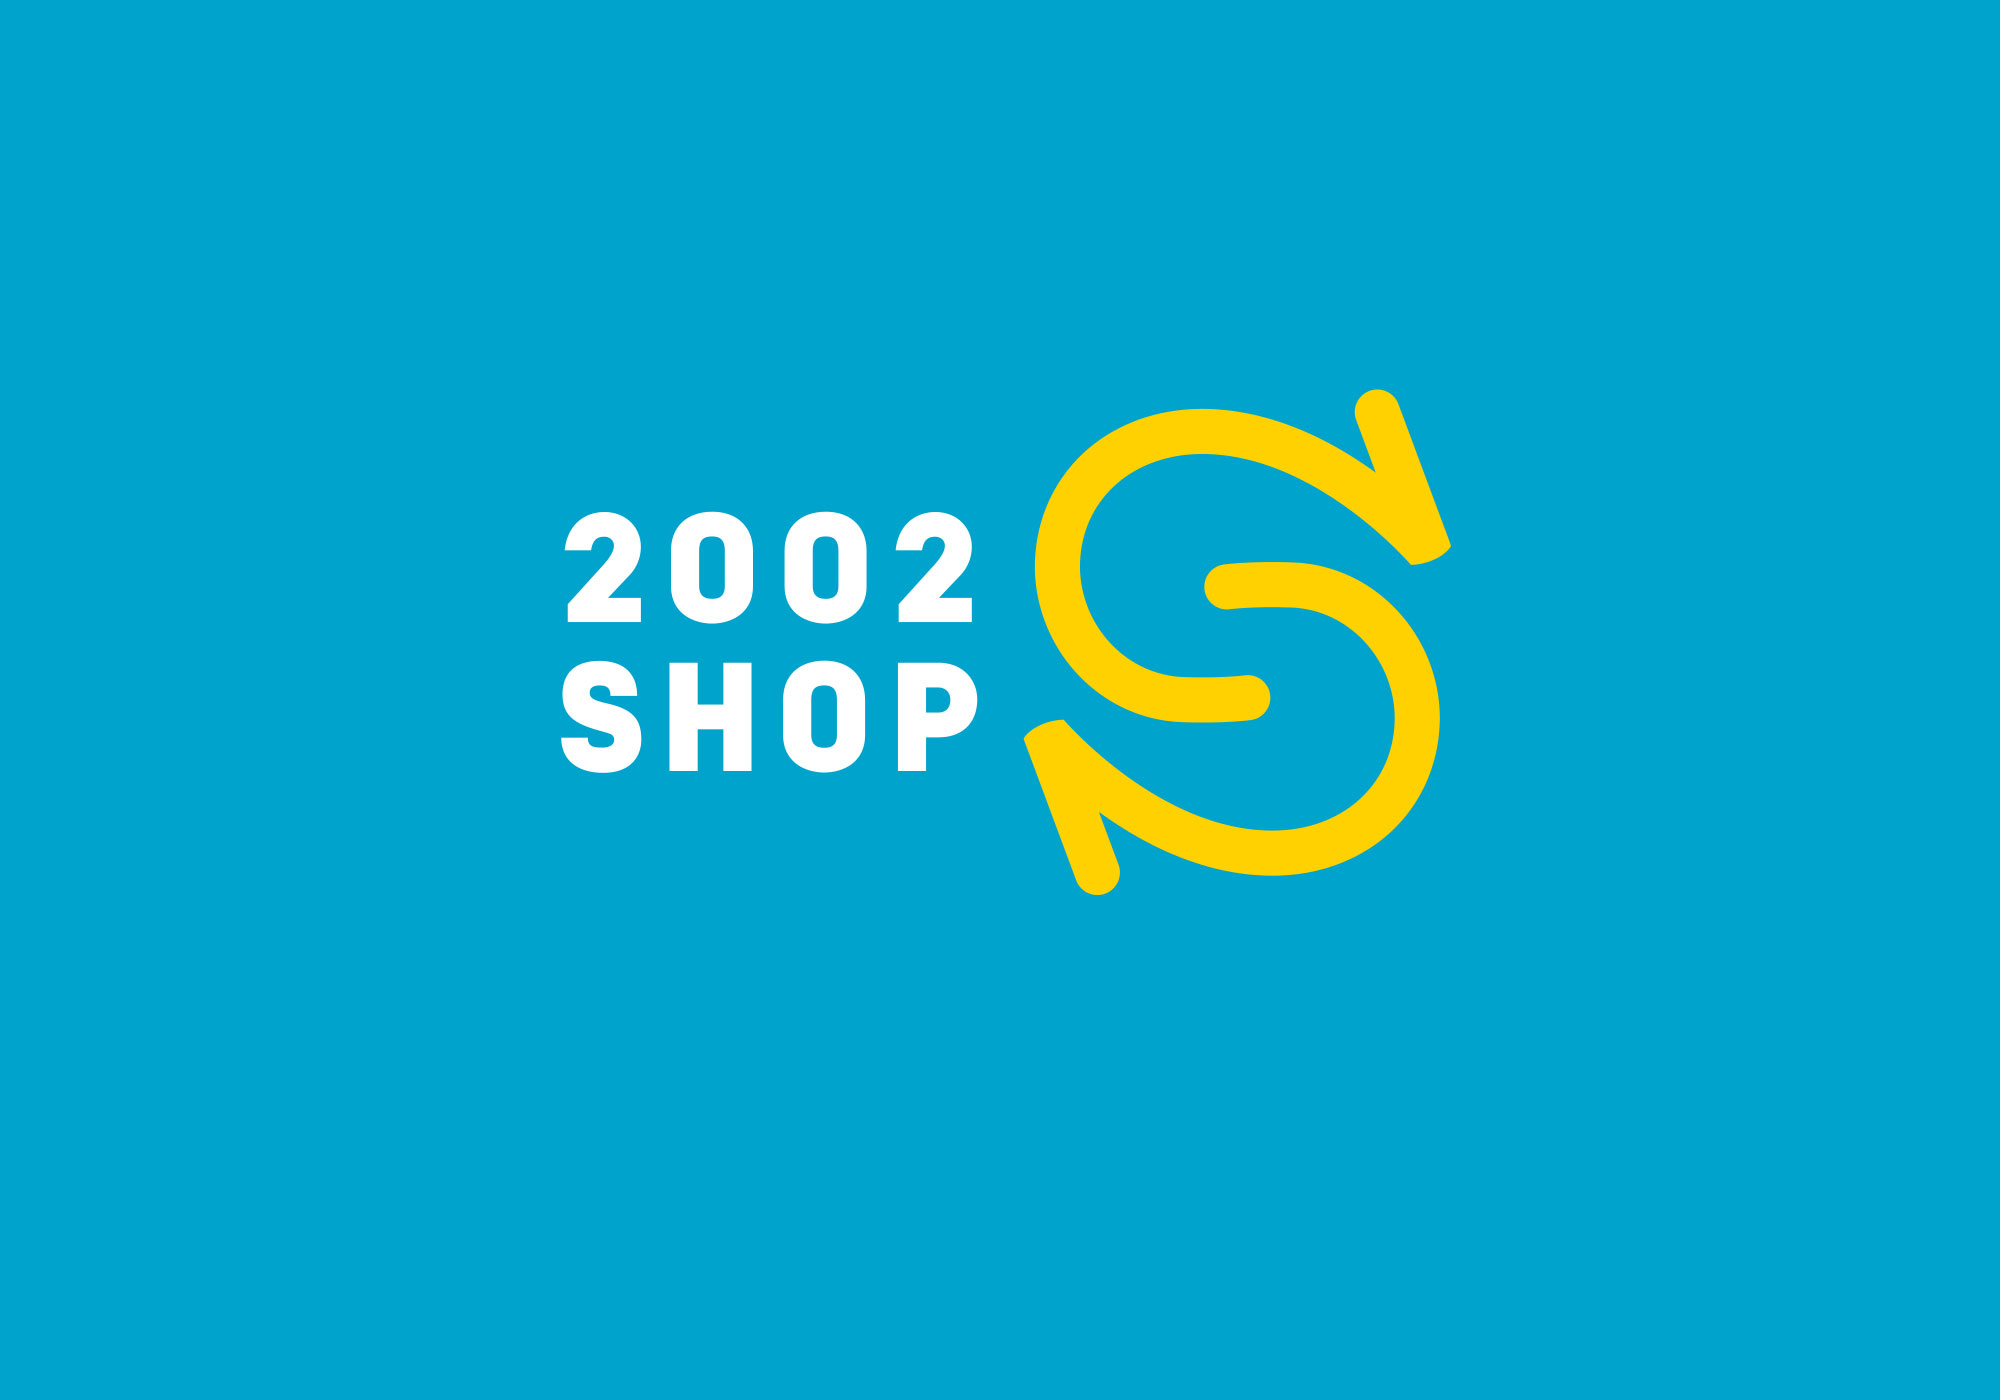 Impulsar-2002shop-Logo